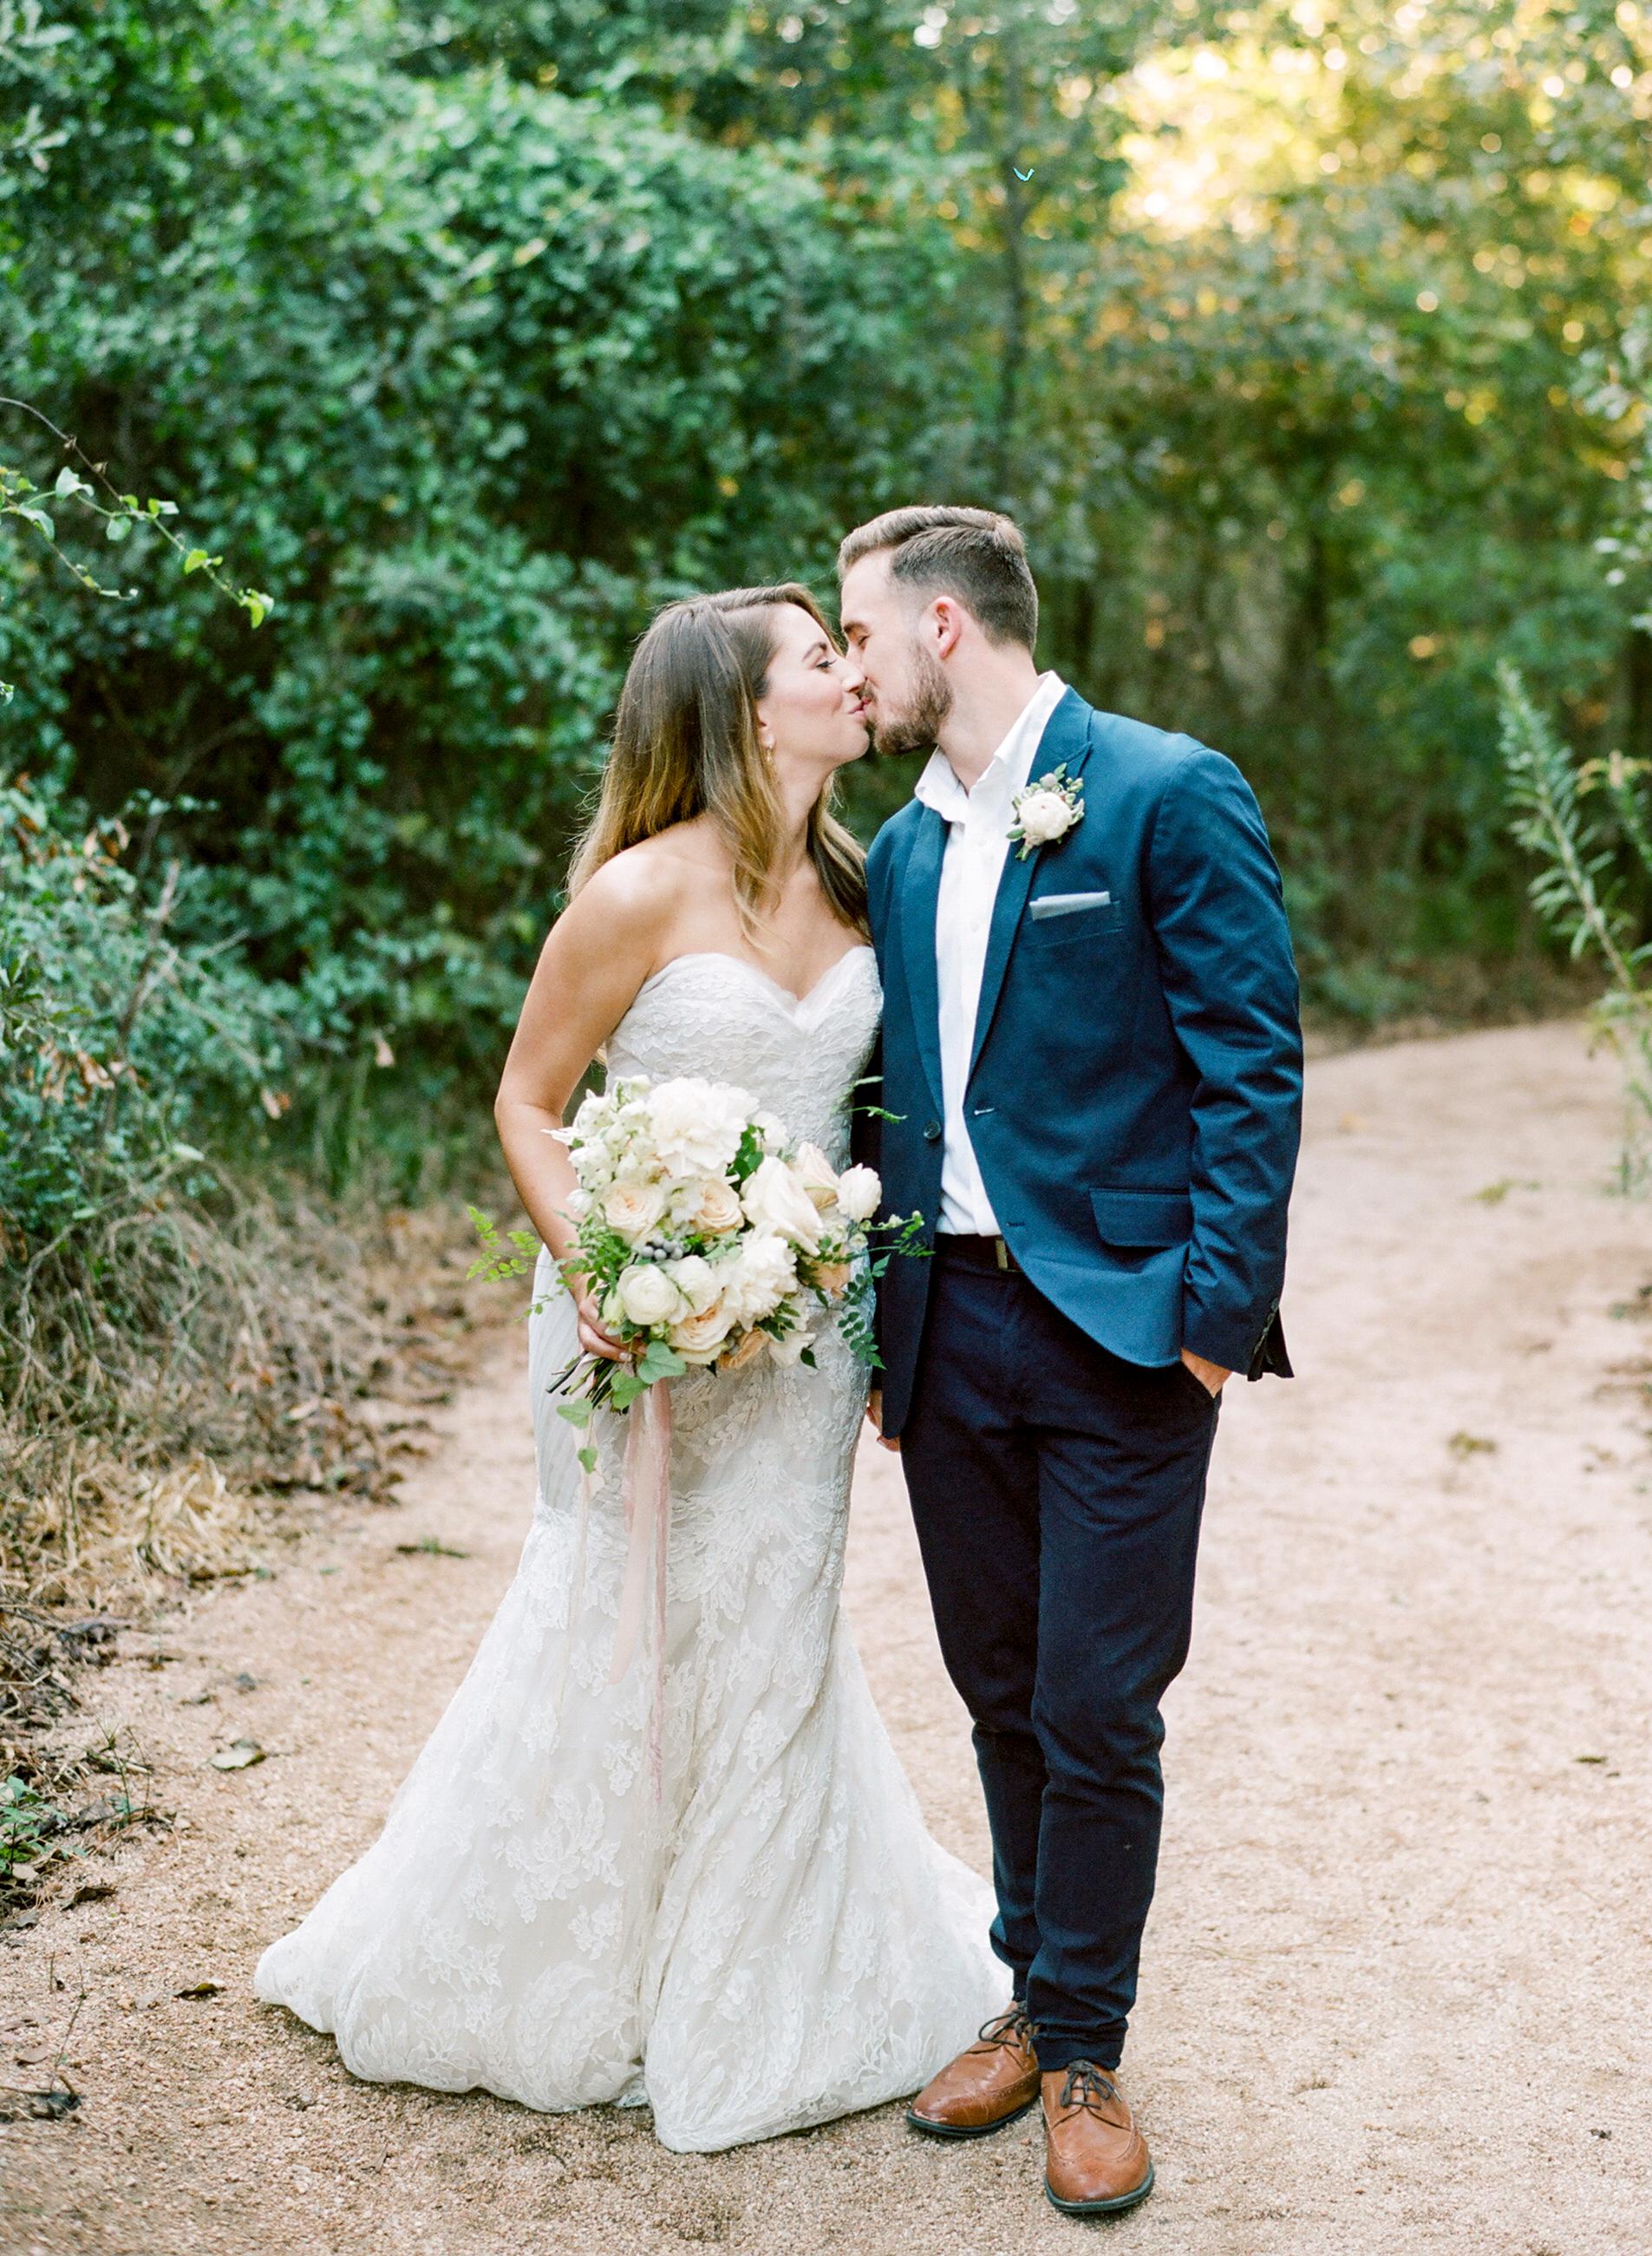 dana-fernandez-photography-the-wedding-chicks-film-houston-wedding-photography-destination-2.jpg